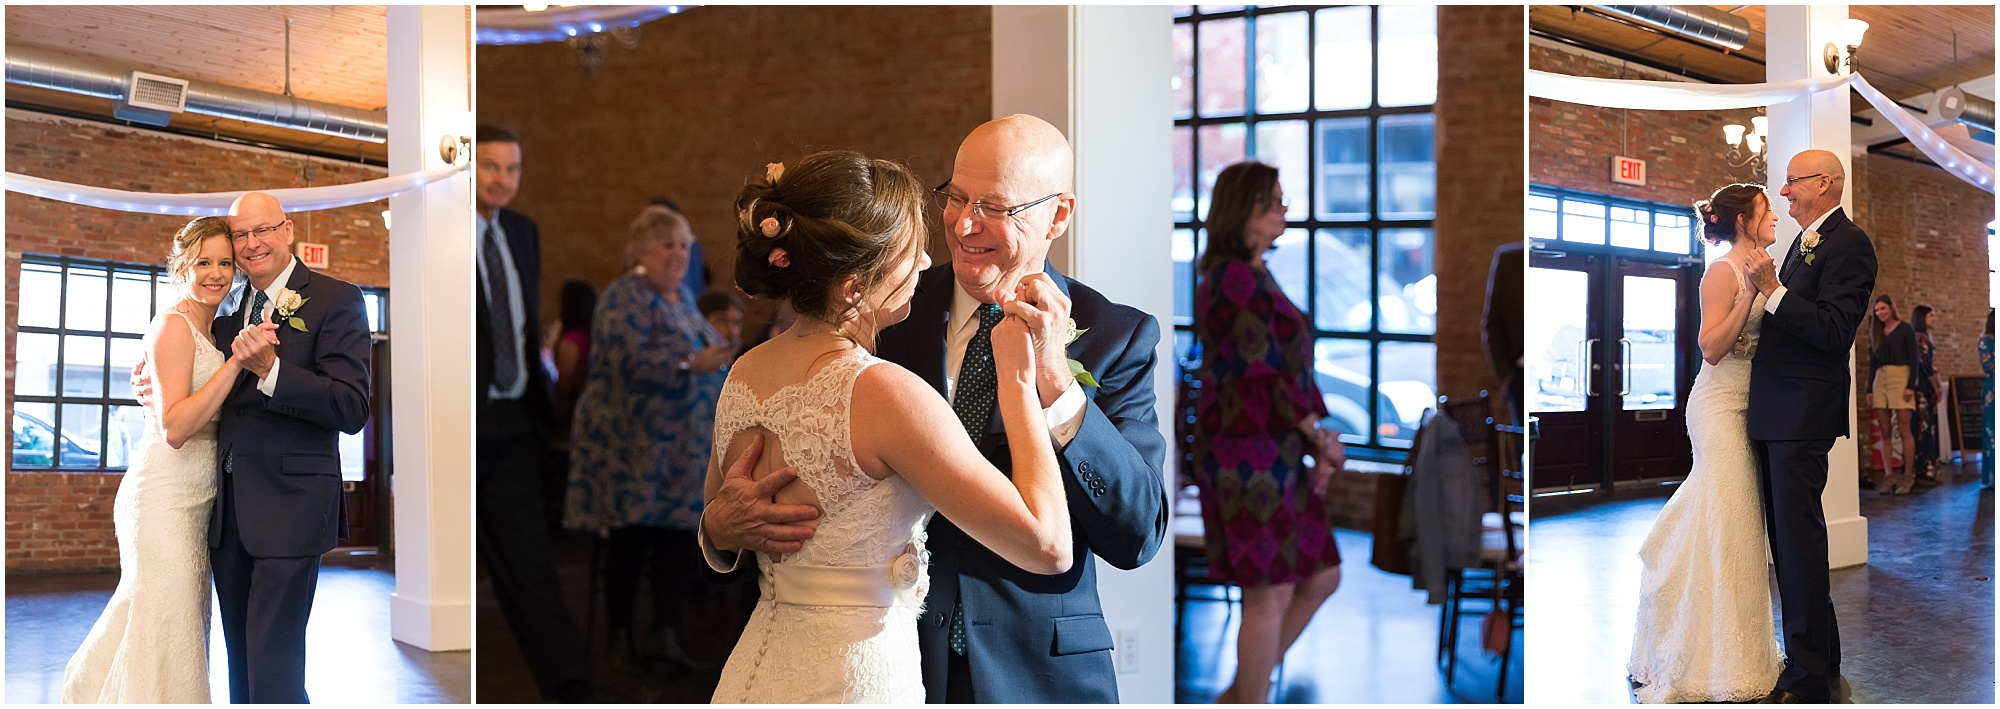 Father-daughter dance at reception at The Palladium - Jason & Melaina Photography - www.jasonandmelaina.com